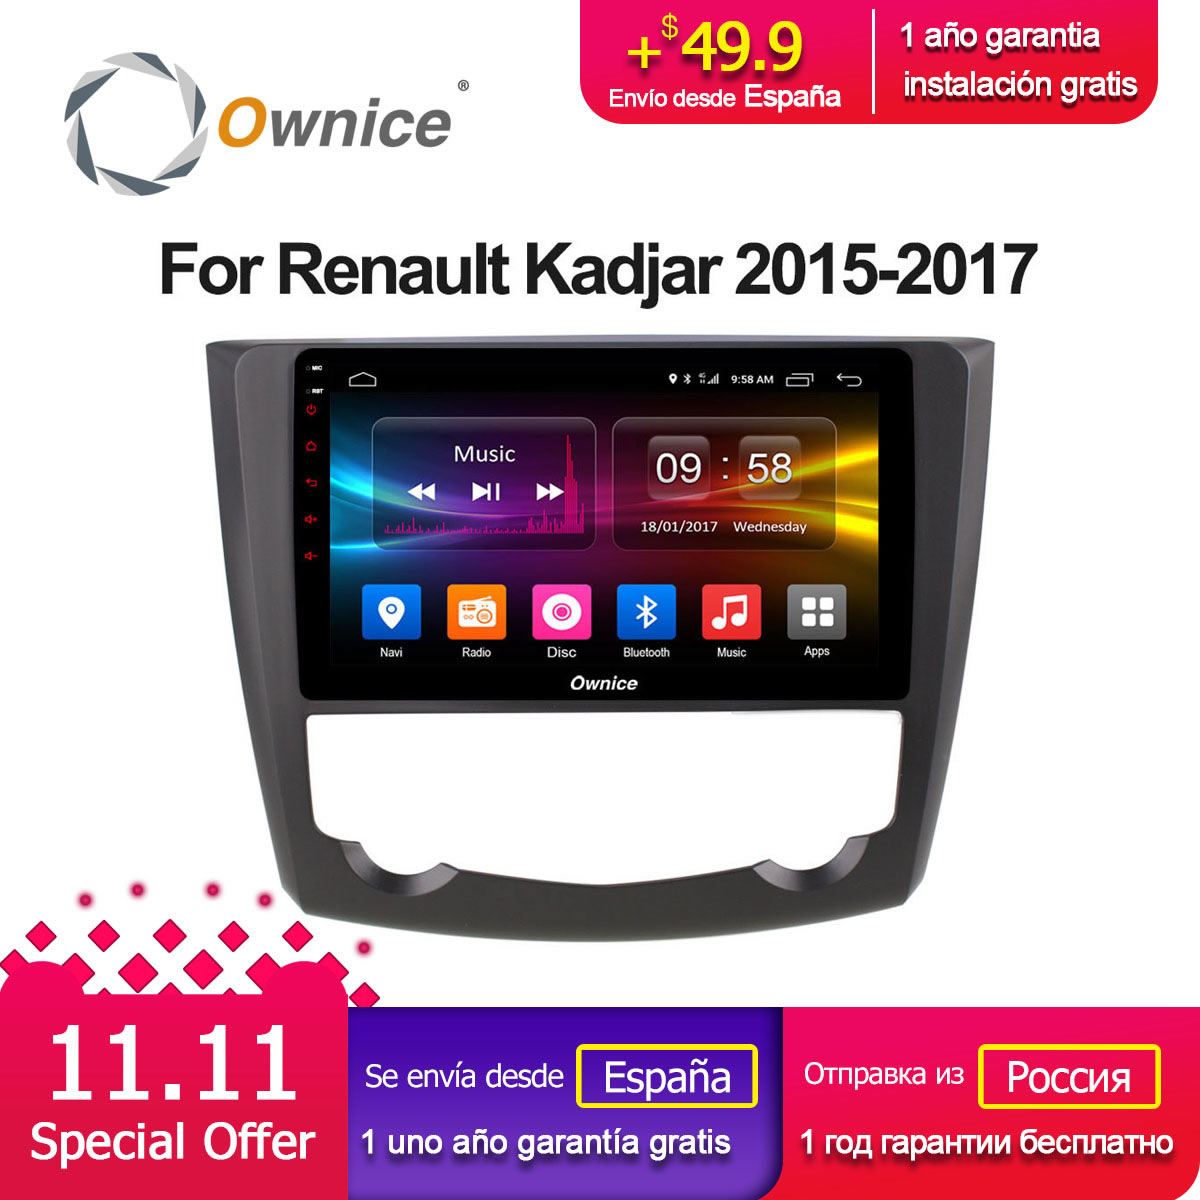 Renault Kadjar 2015 2017 Remote Start Wiring Diagrams Free Navigation Diagram Description Ownice C500 G10 Octa Re Android 81 32g Rom Car Dvd Player Gps Audio For Fullbrochure2016